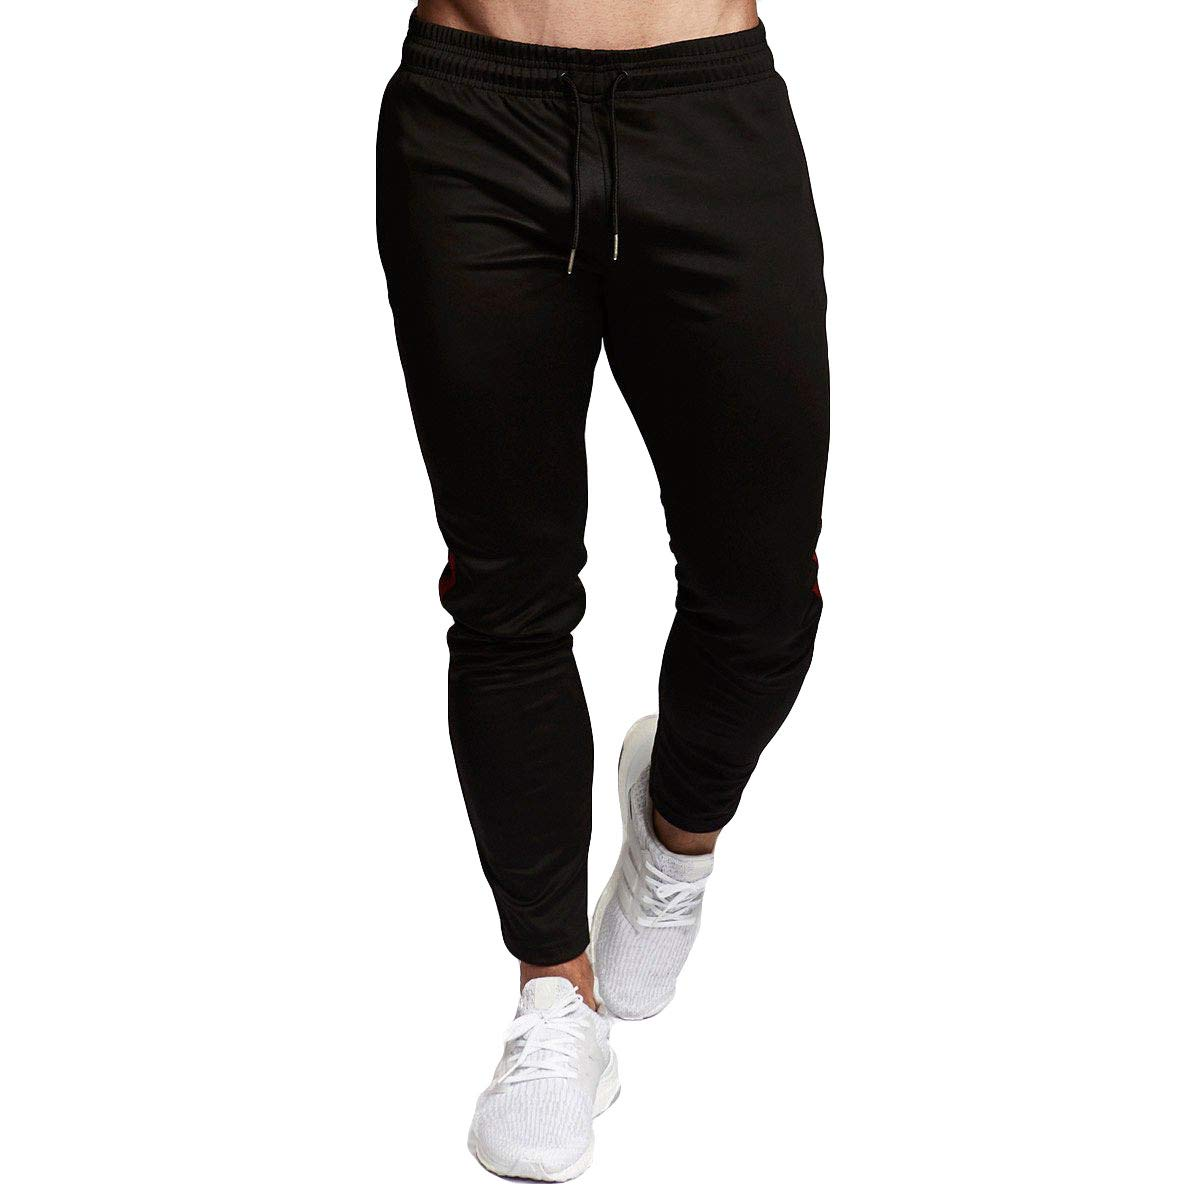 Maca.lina Mens Slim Striped Sweatpants Joggers Leggings Long Pants